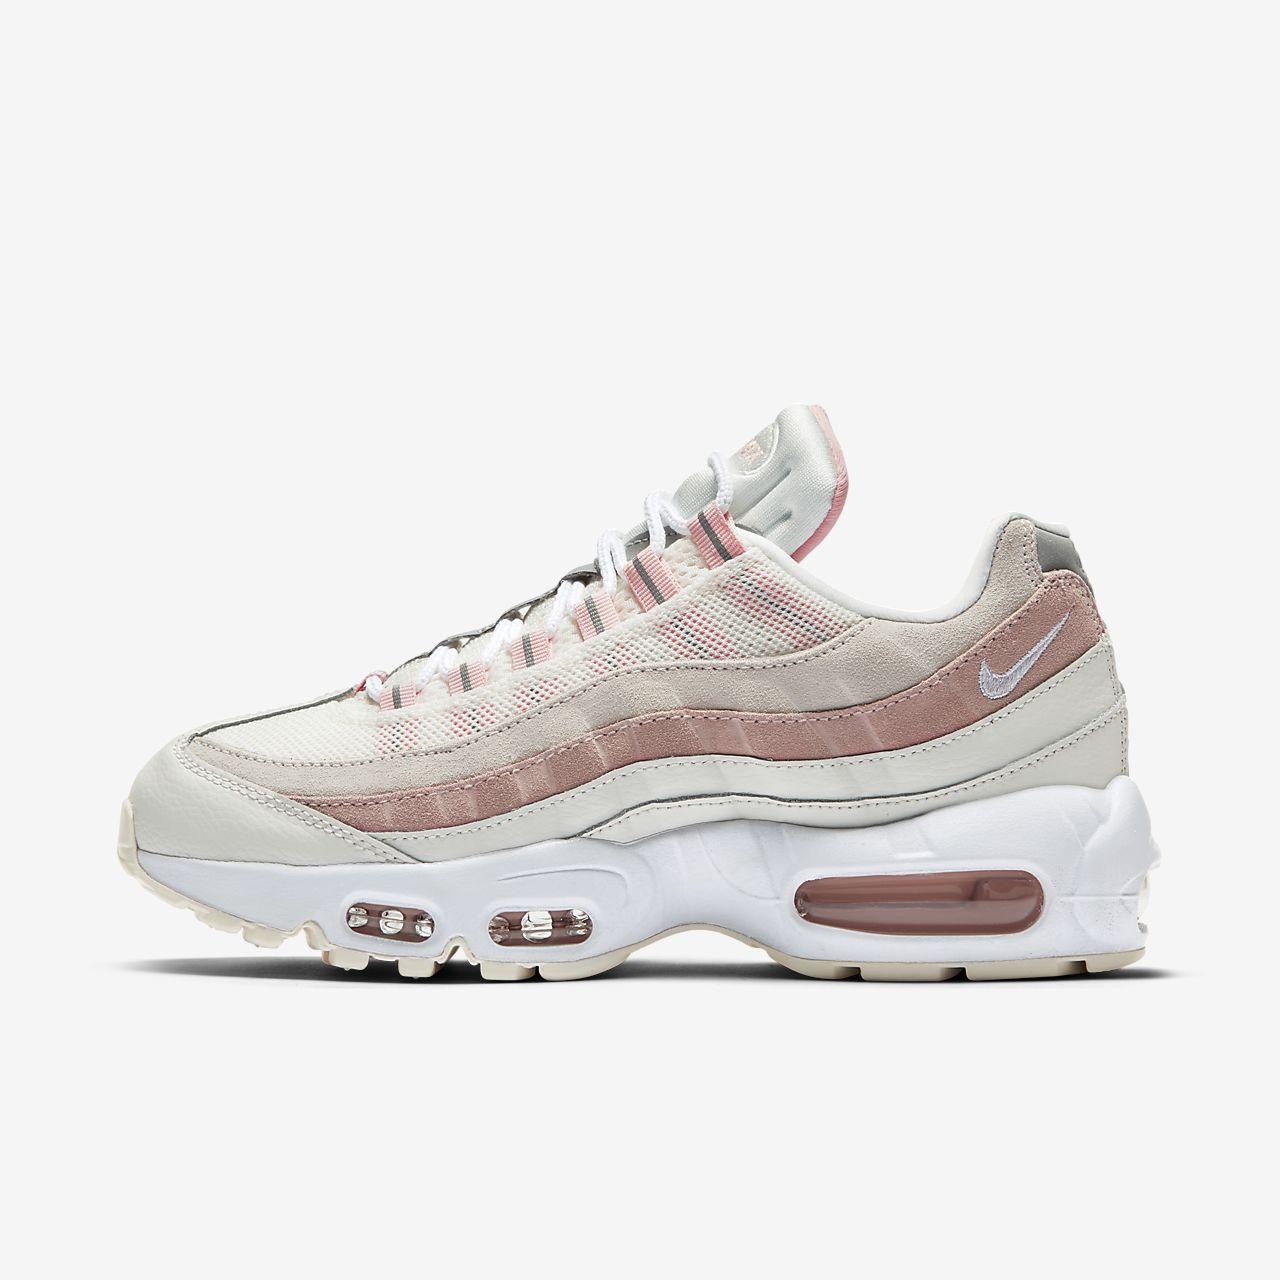 online retailer 583b8 ec308 Nike Air Max 95 Women's Shoe